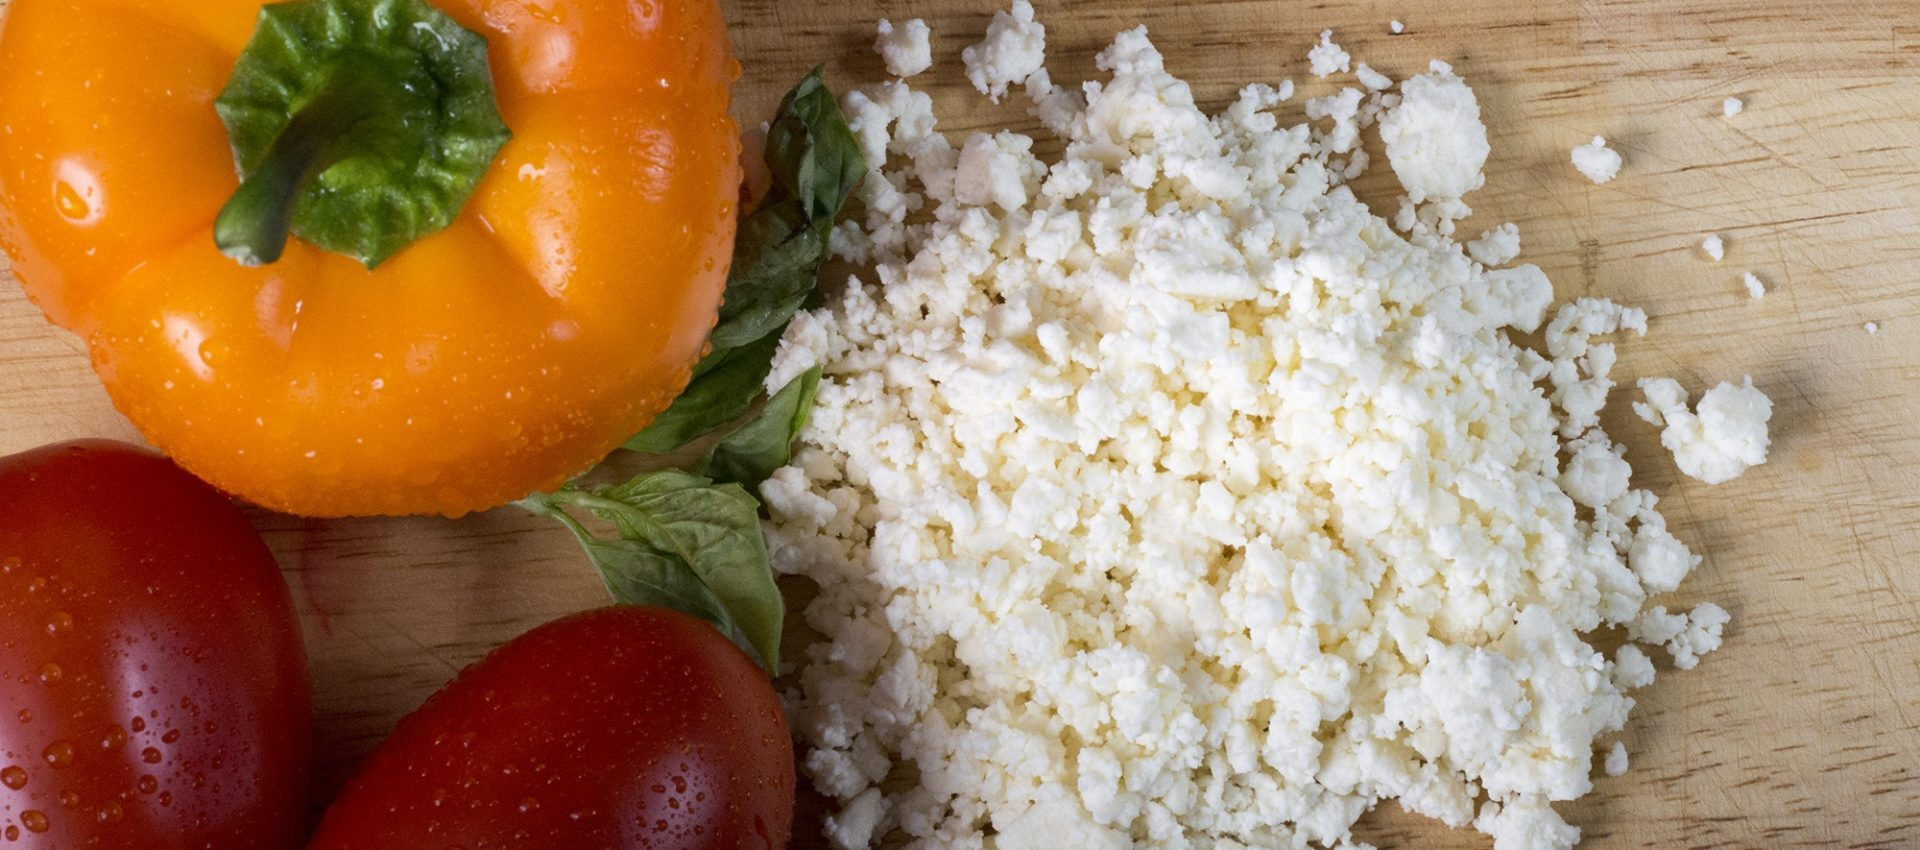 Poivron, tomate et feta au cookeo